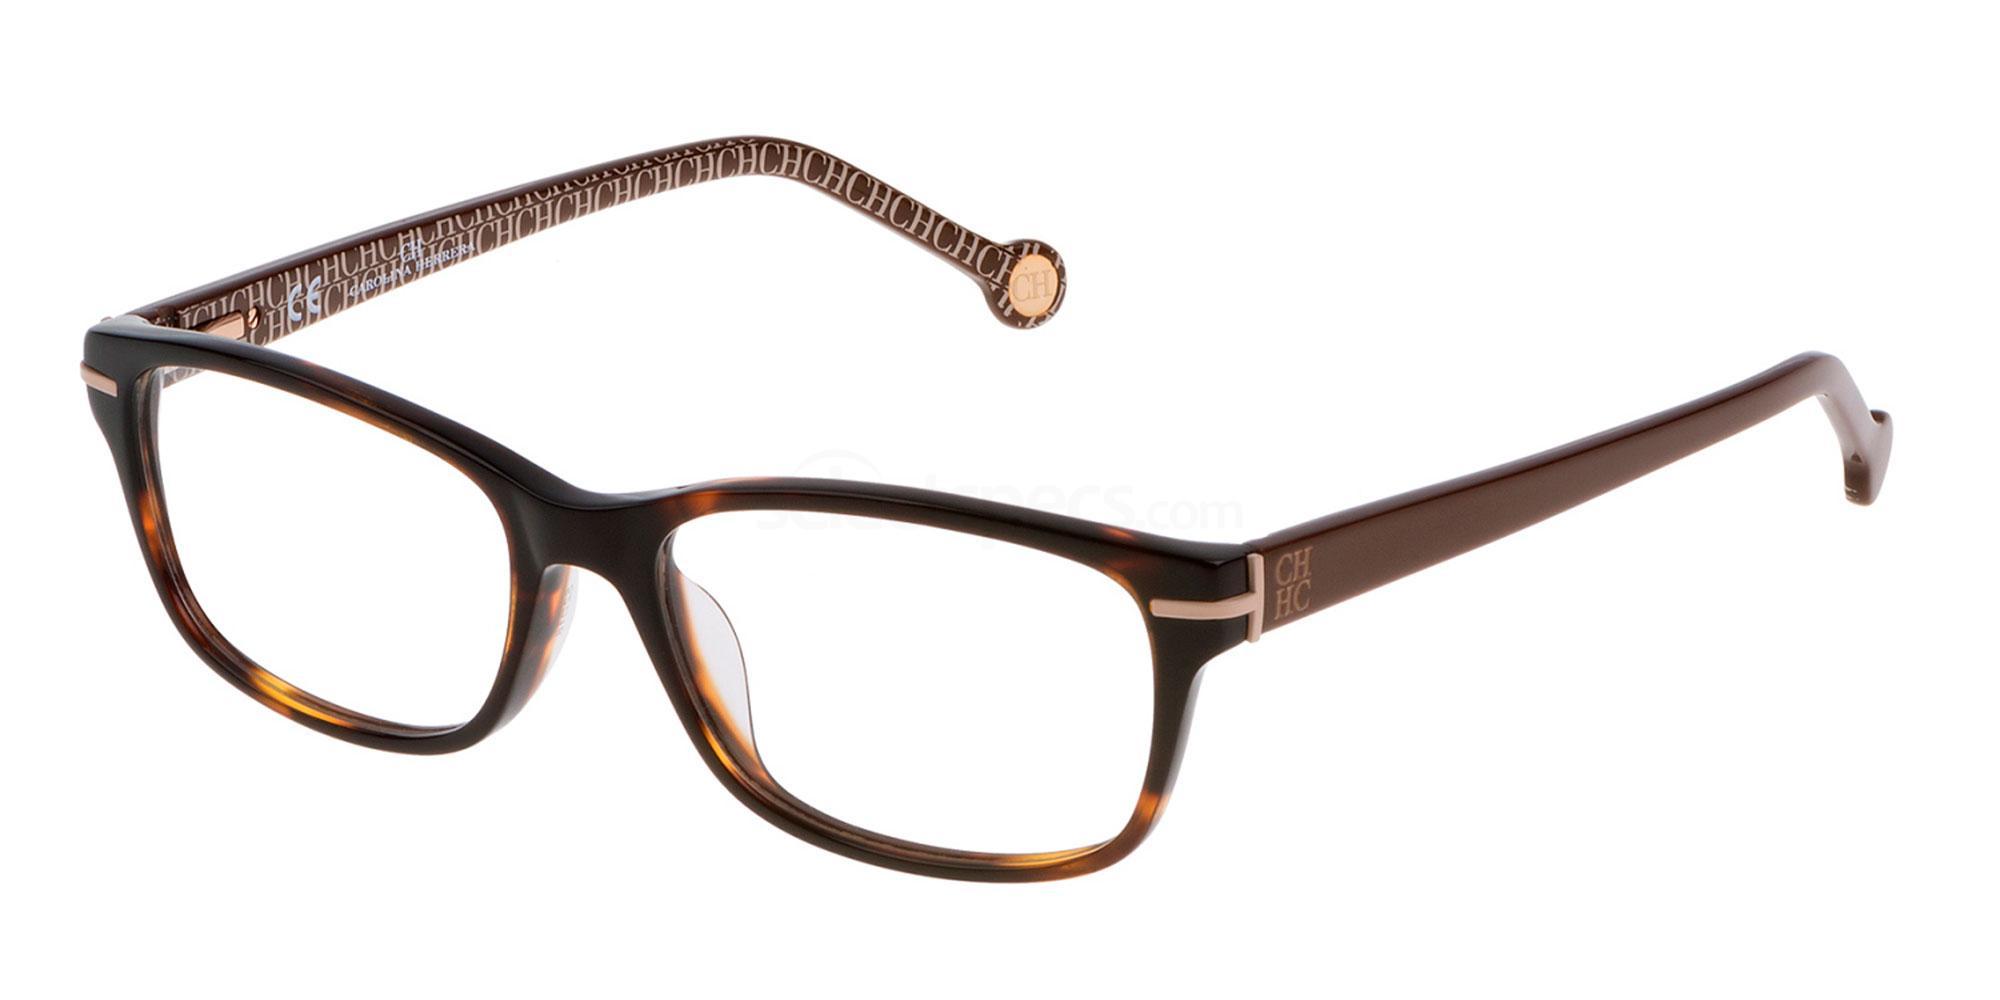 0743 VHE634 Glasses, CH Carolina Herrera